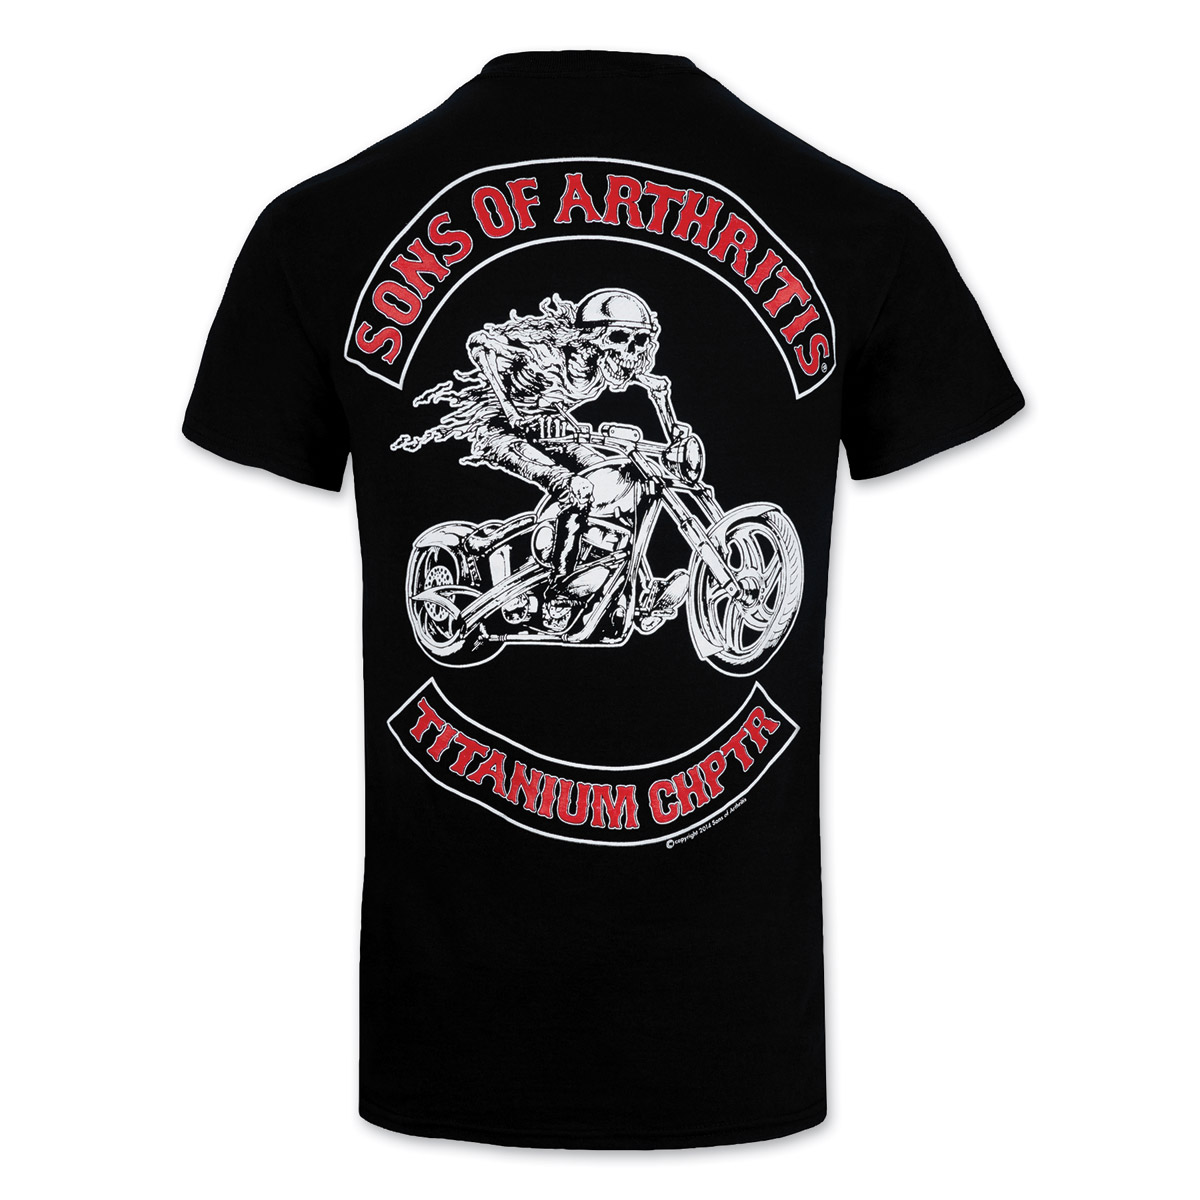 Sons of Arthritis Men's Titanium Chapter Black T-Shirt